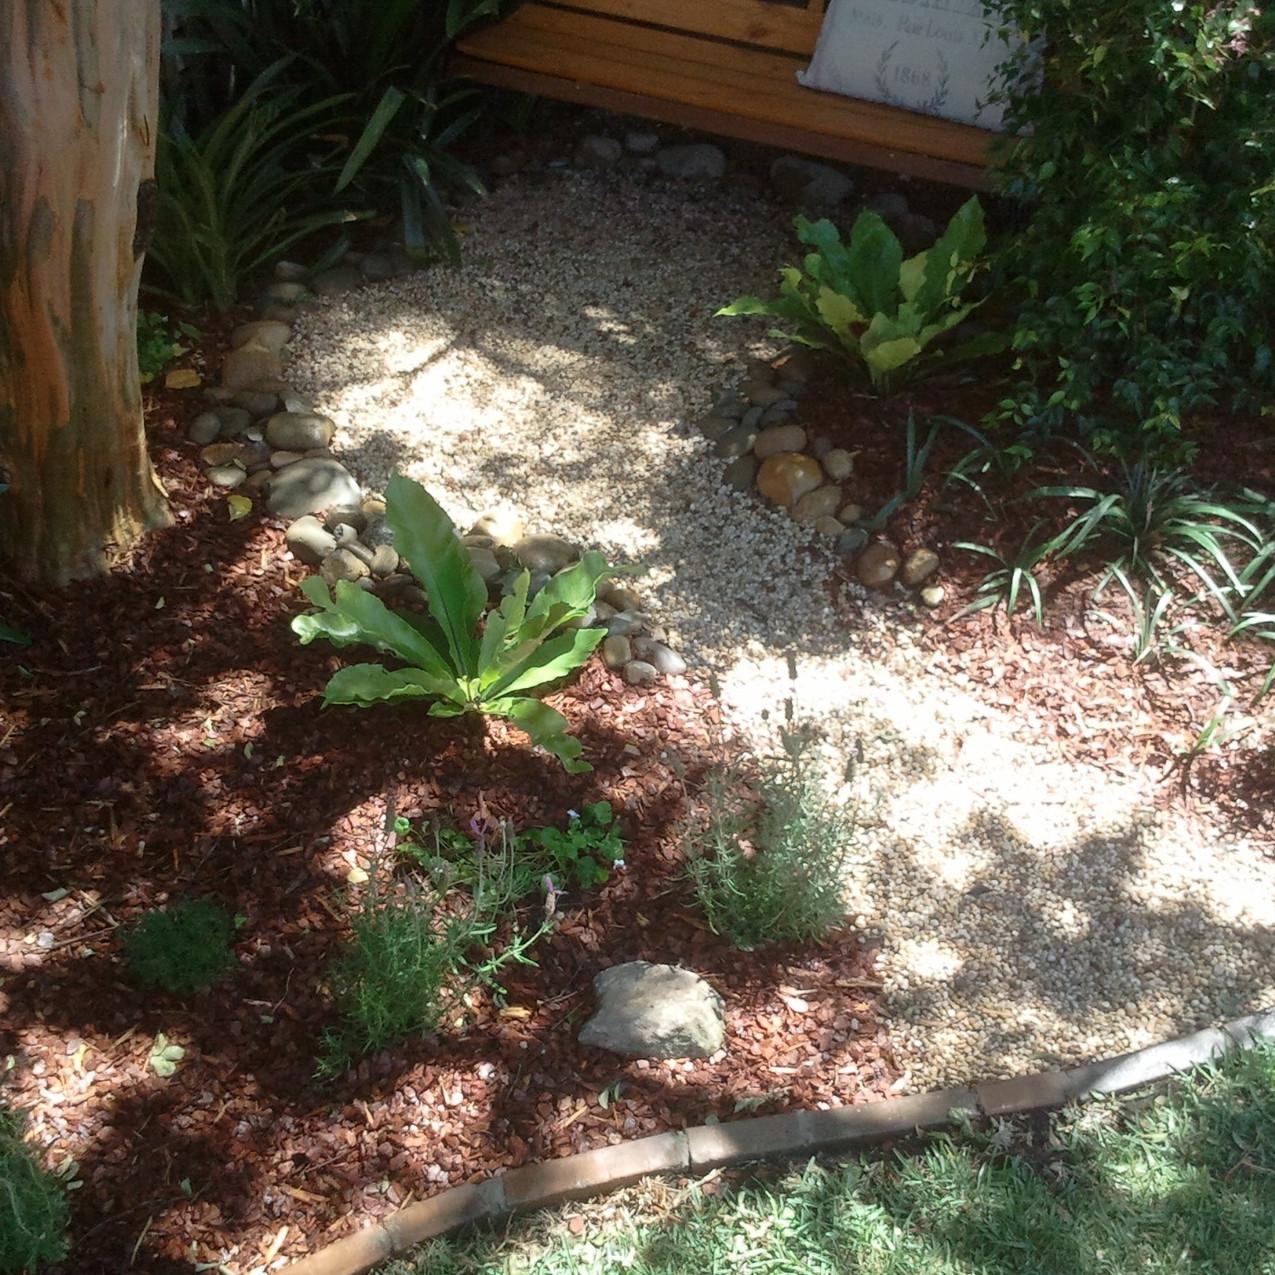 Rodd Point plants